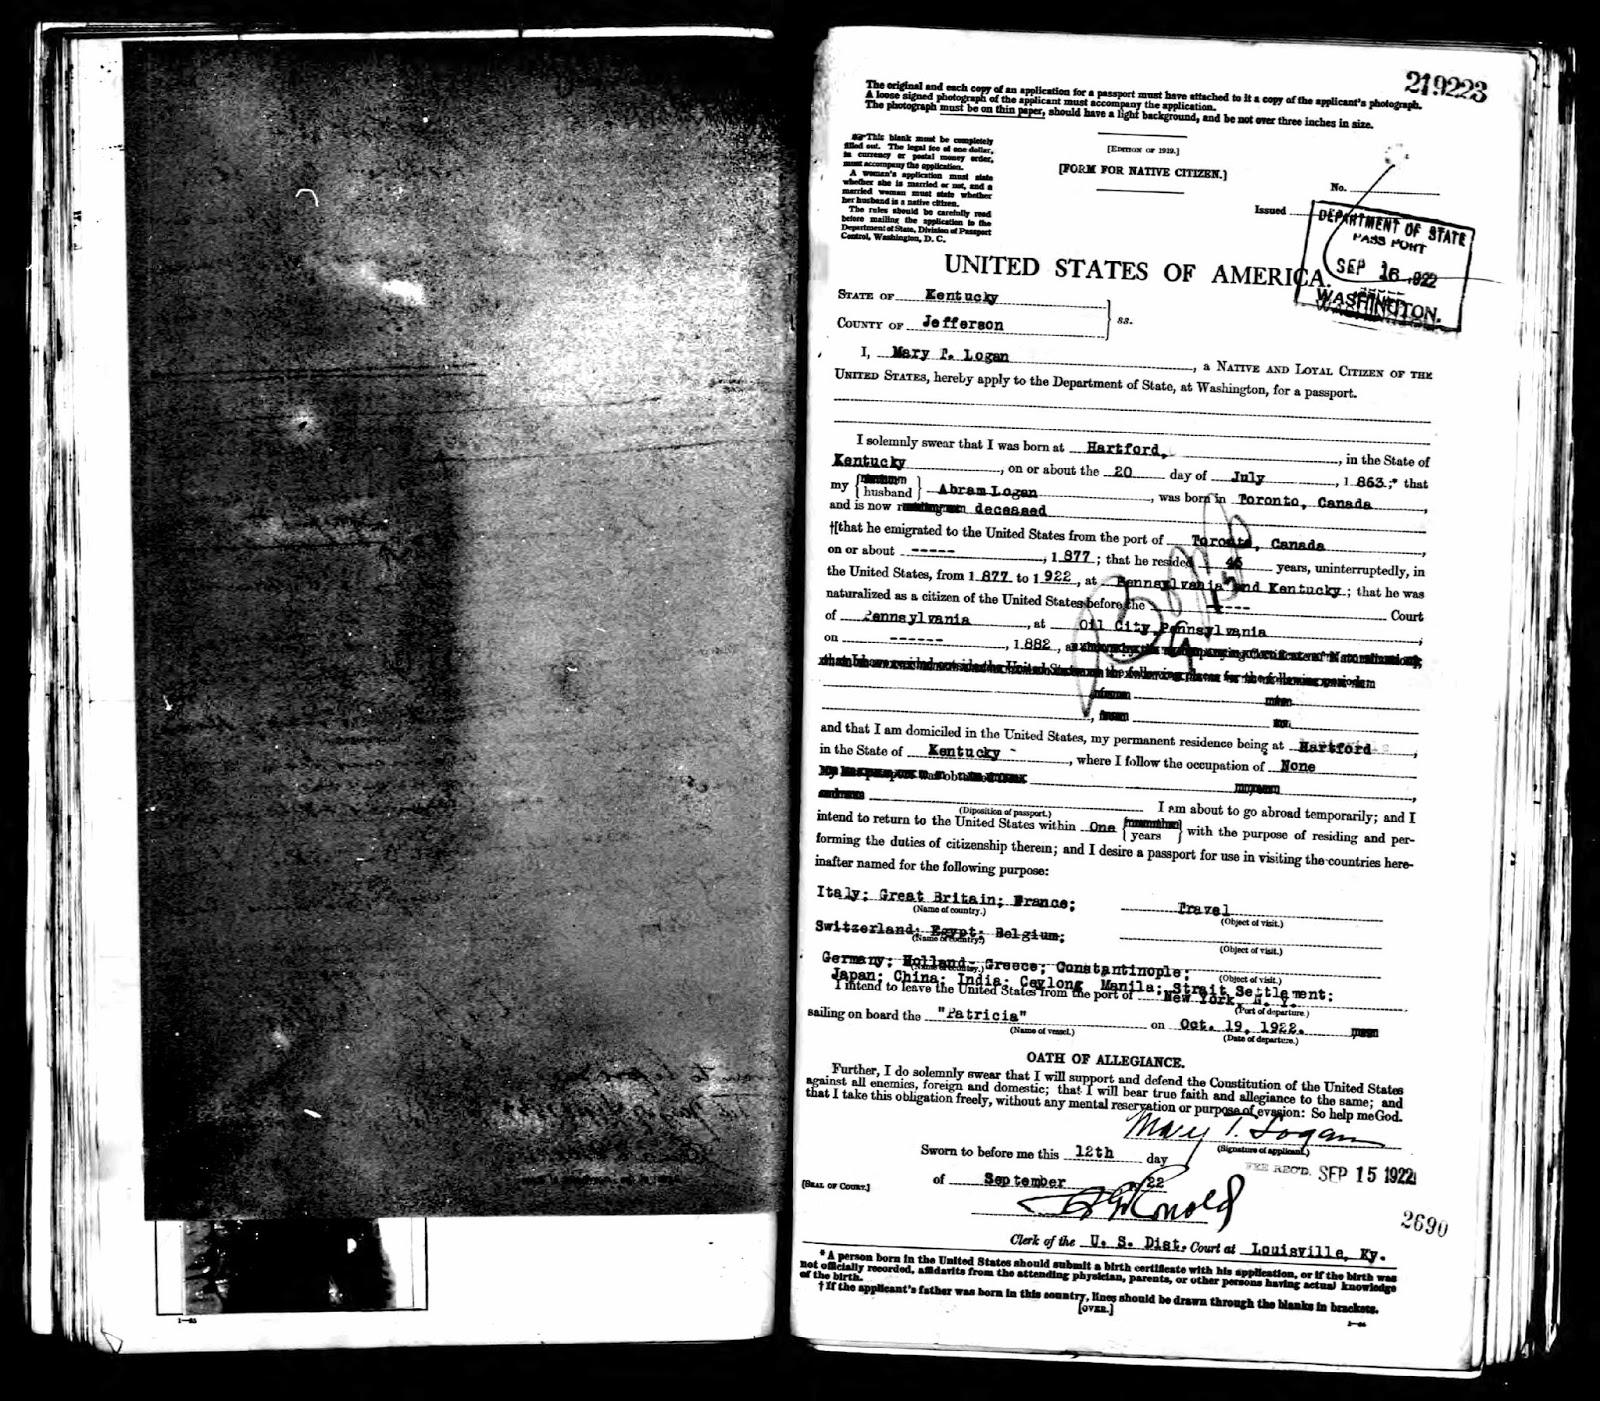 canadian passport application canada post